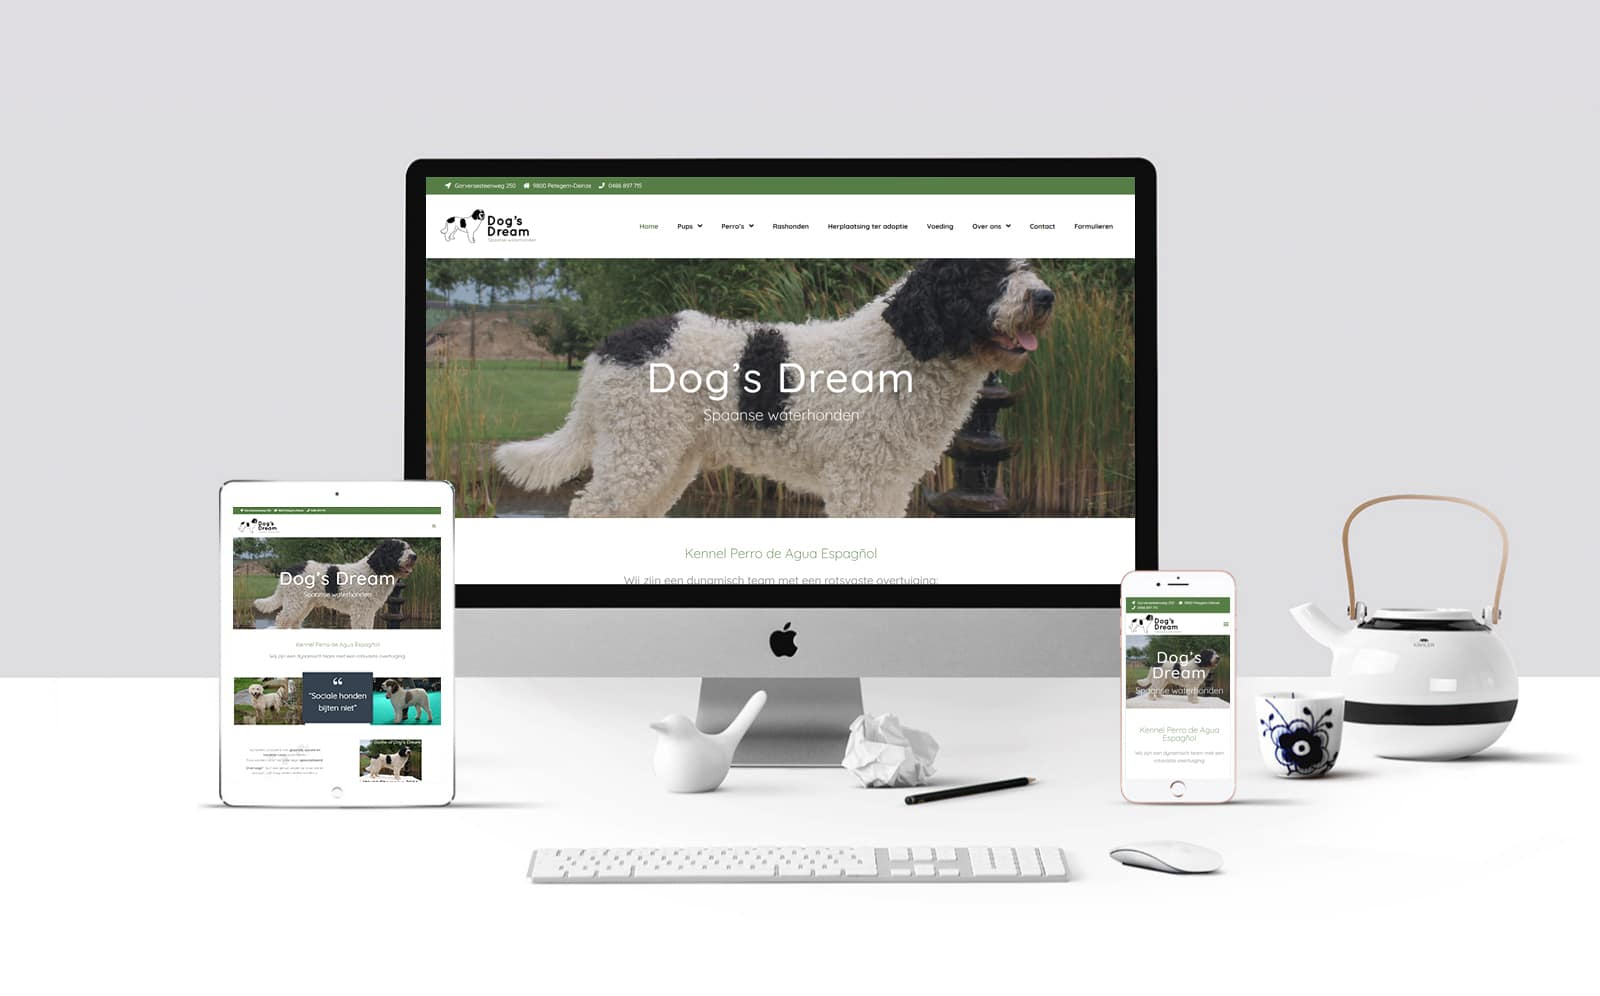 Dog's Dream Spaanse waterhonden – september 2020